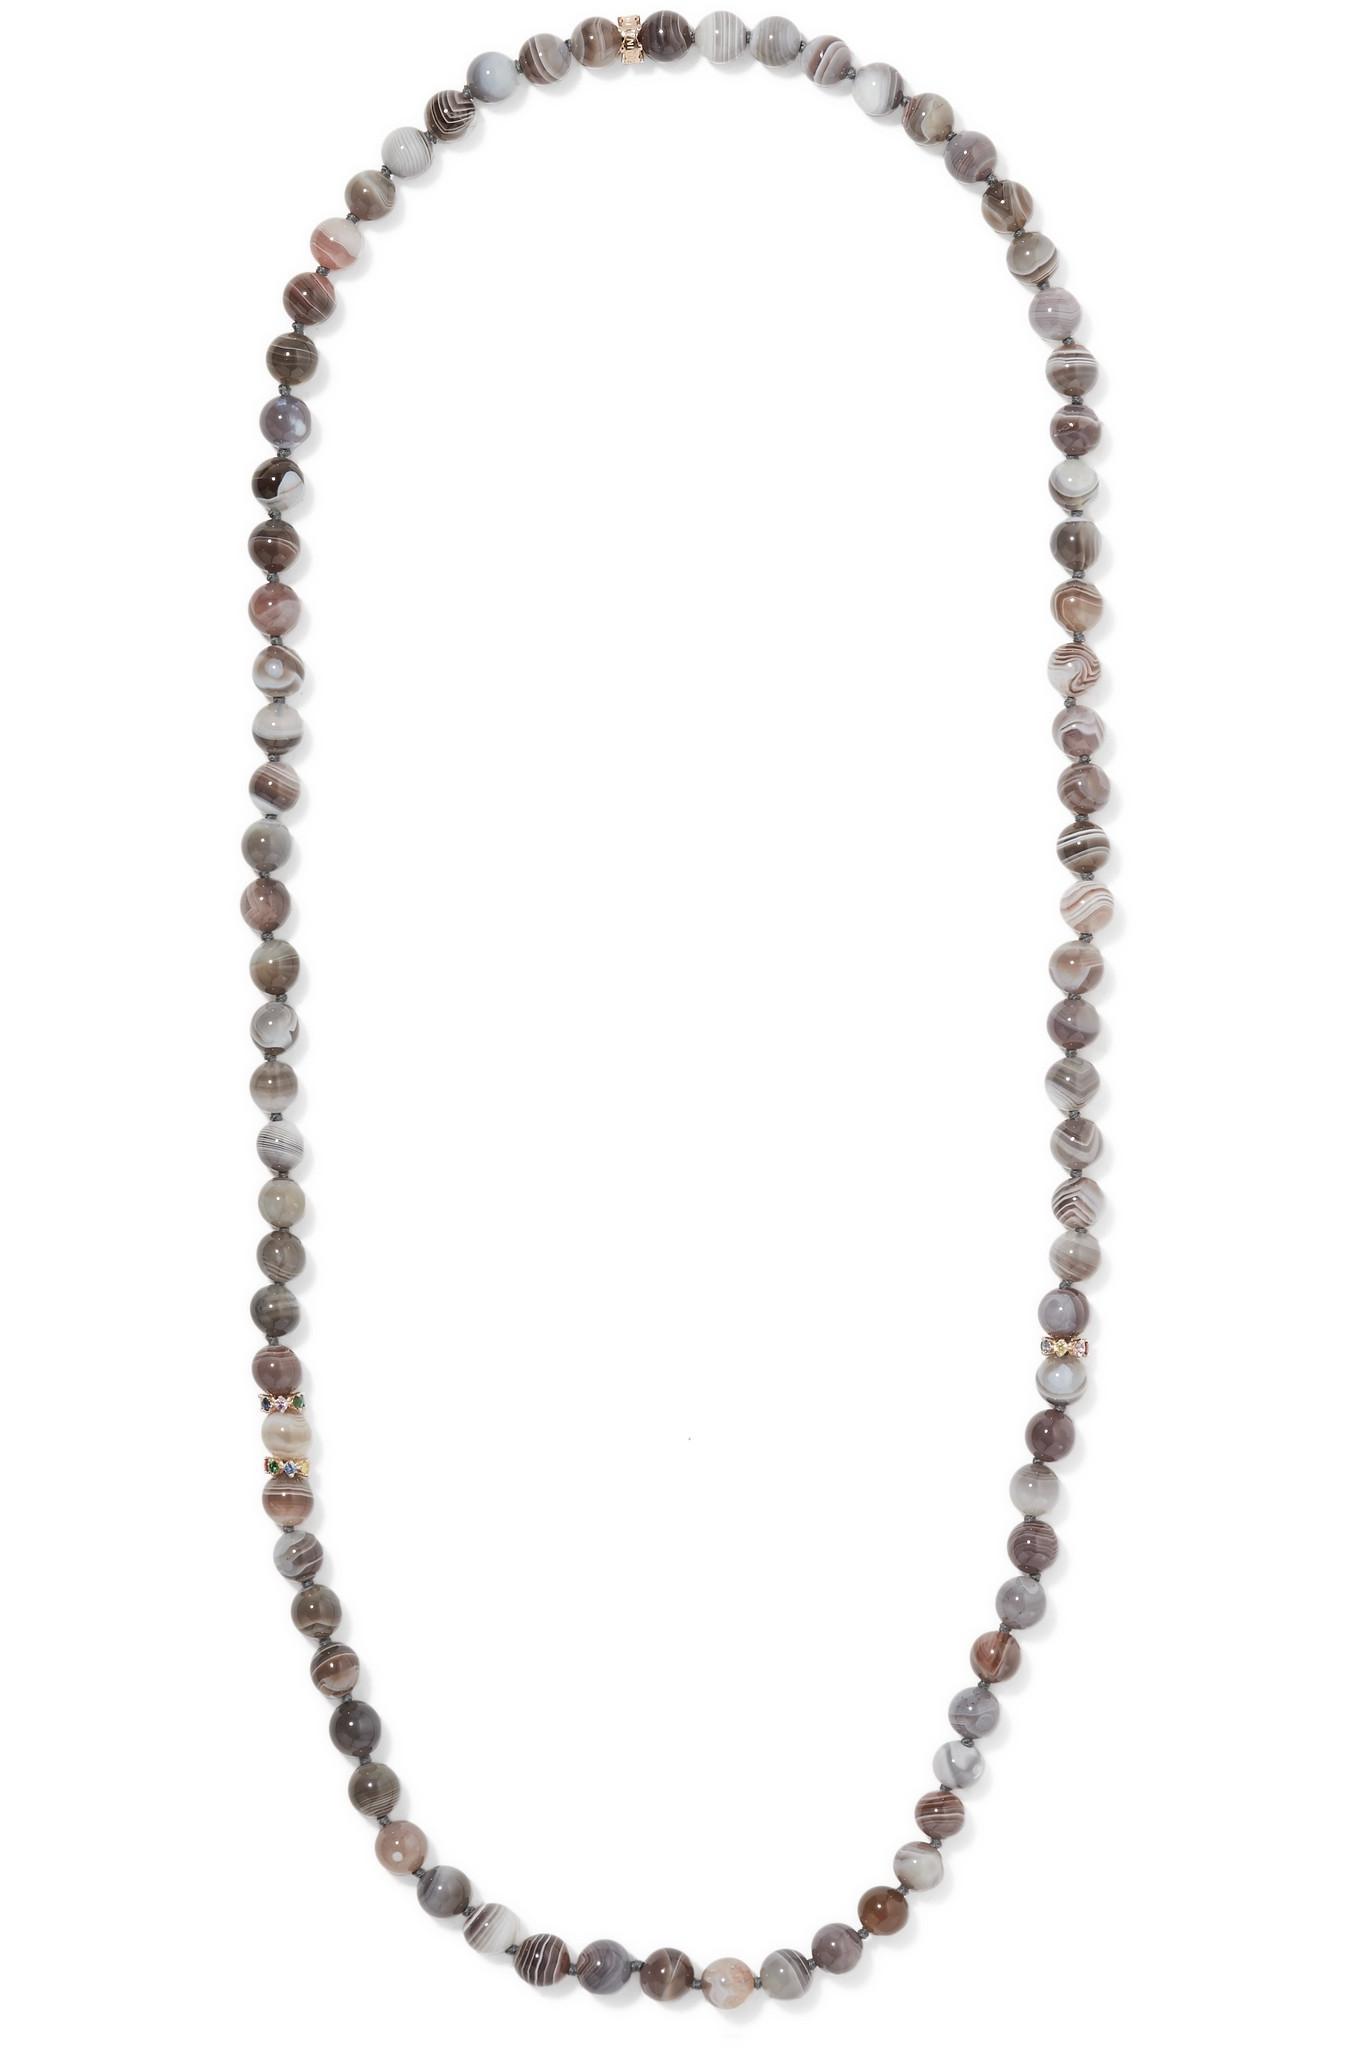 Carolina Bucci Recharmed Multi Stone Necklace In Metallic